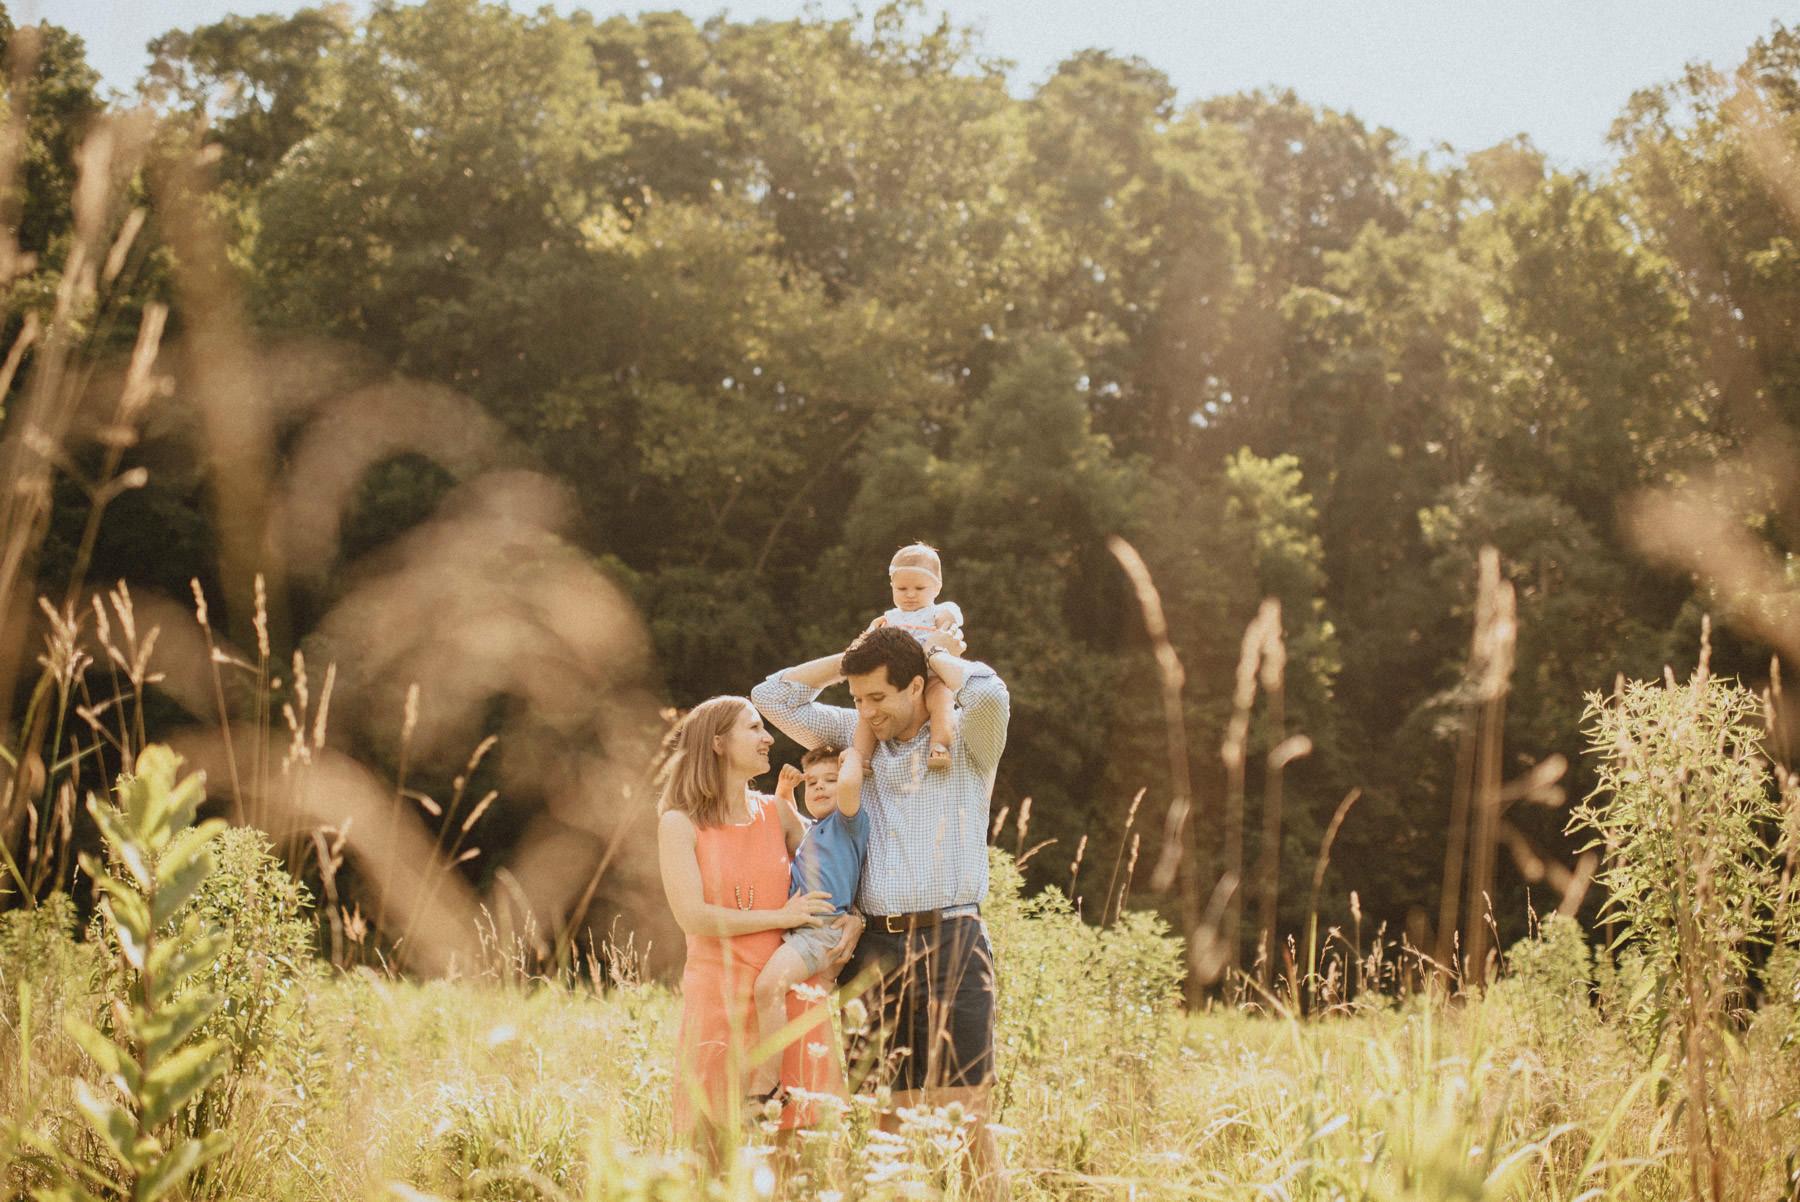 233-wilmington-delaware-family-photographer-2-2.jpg